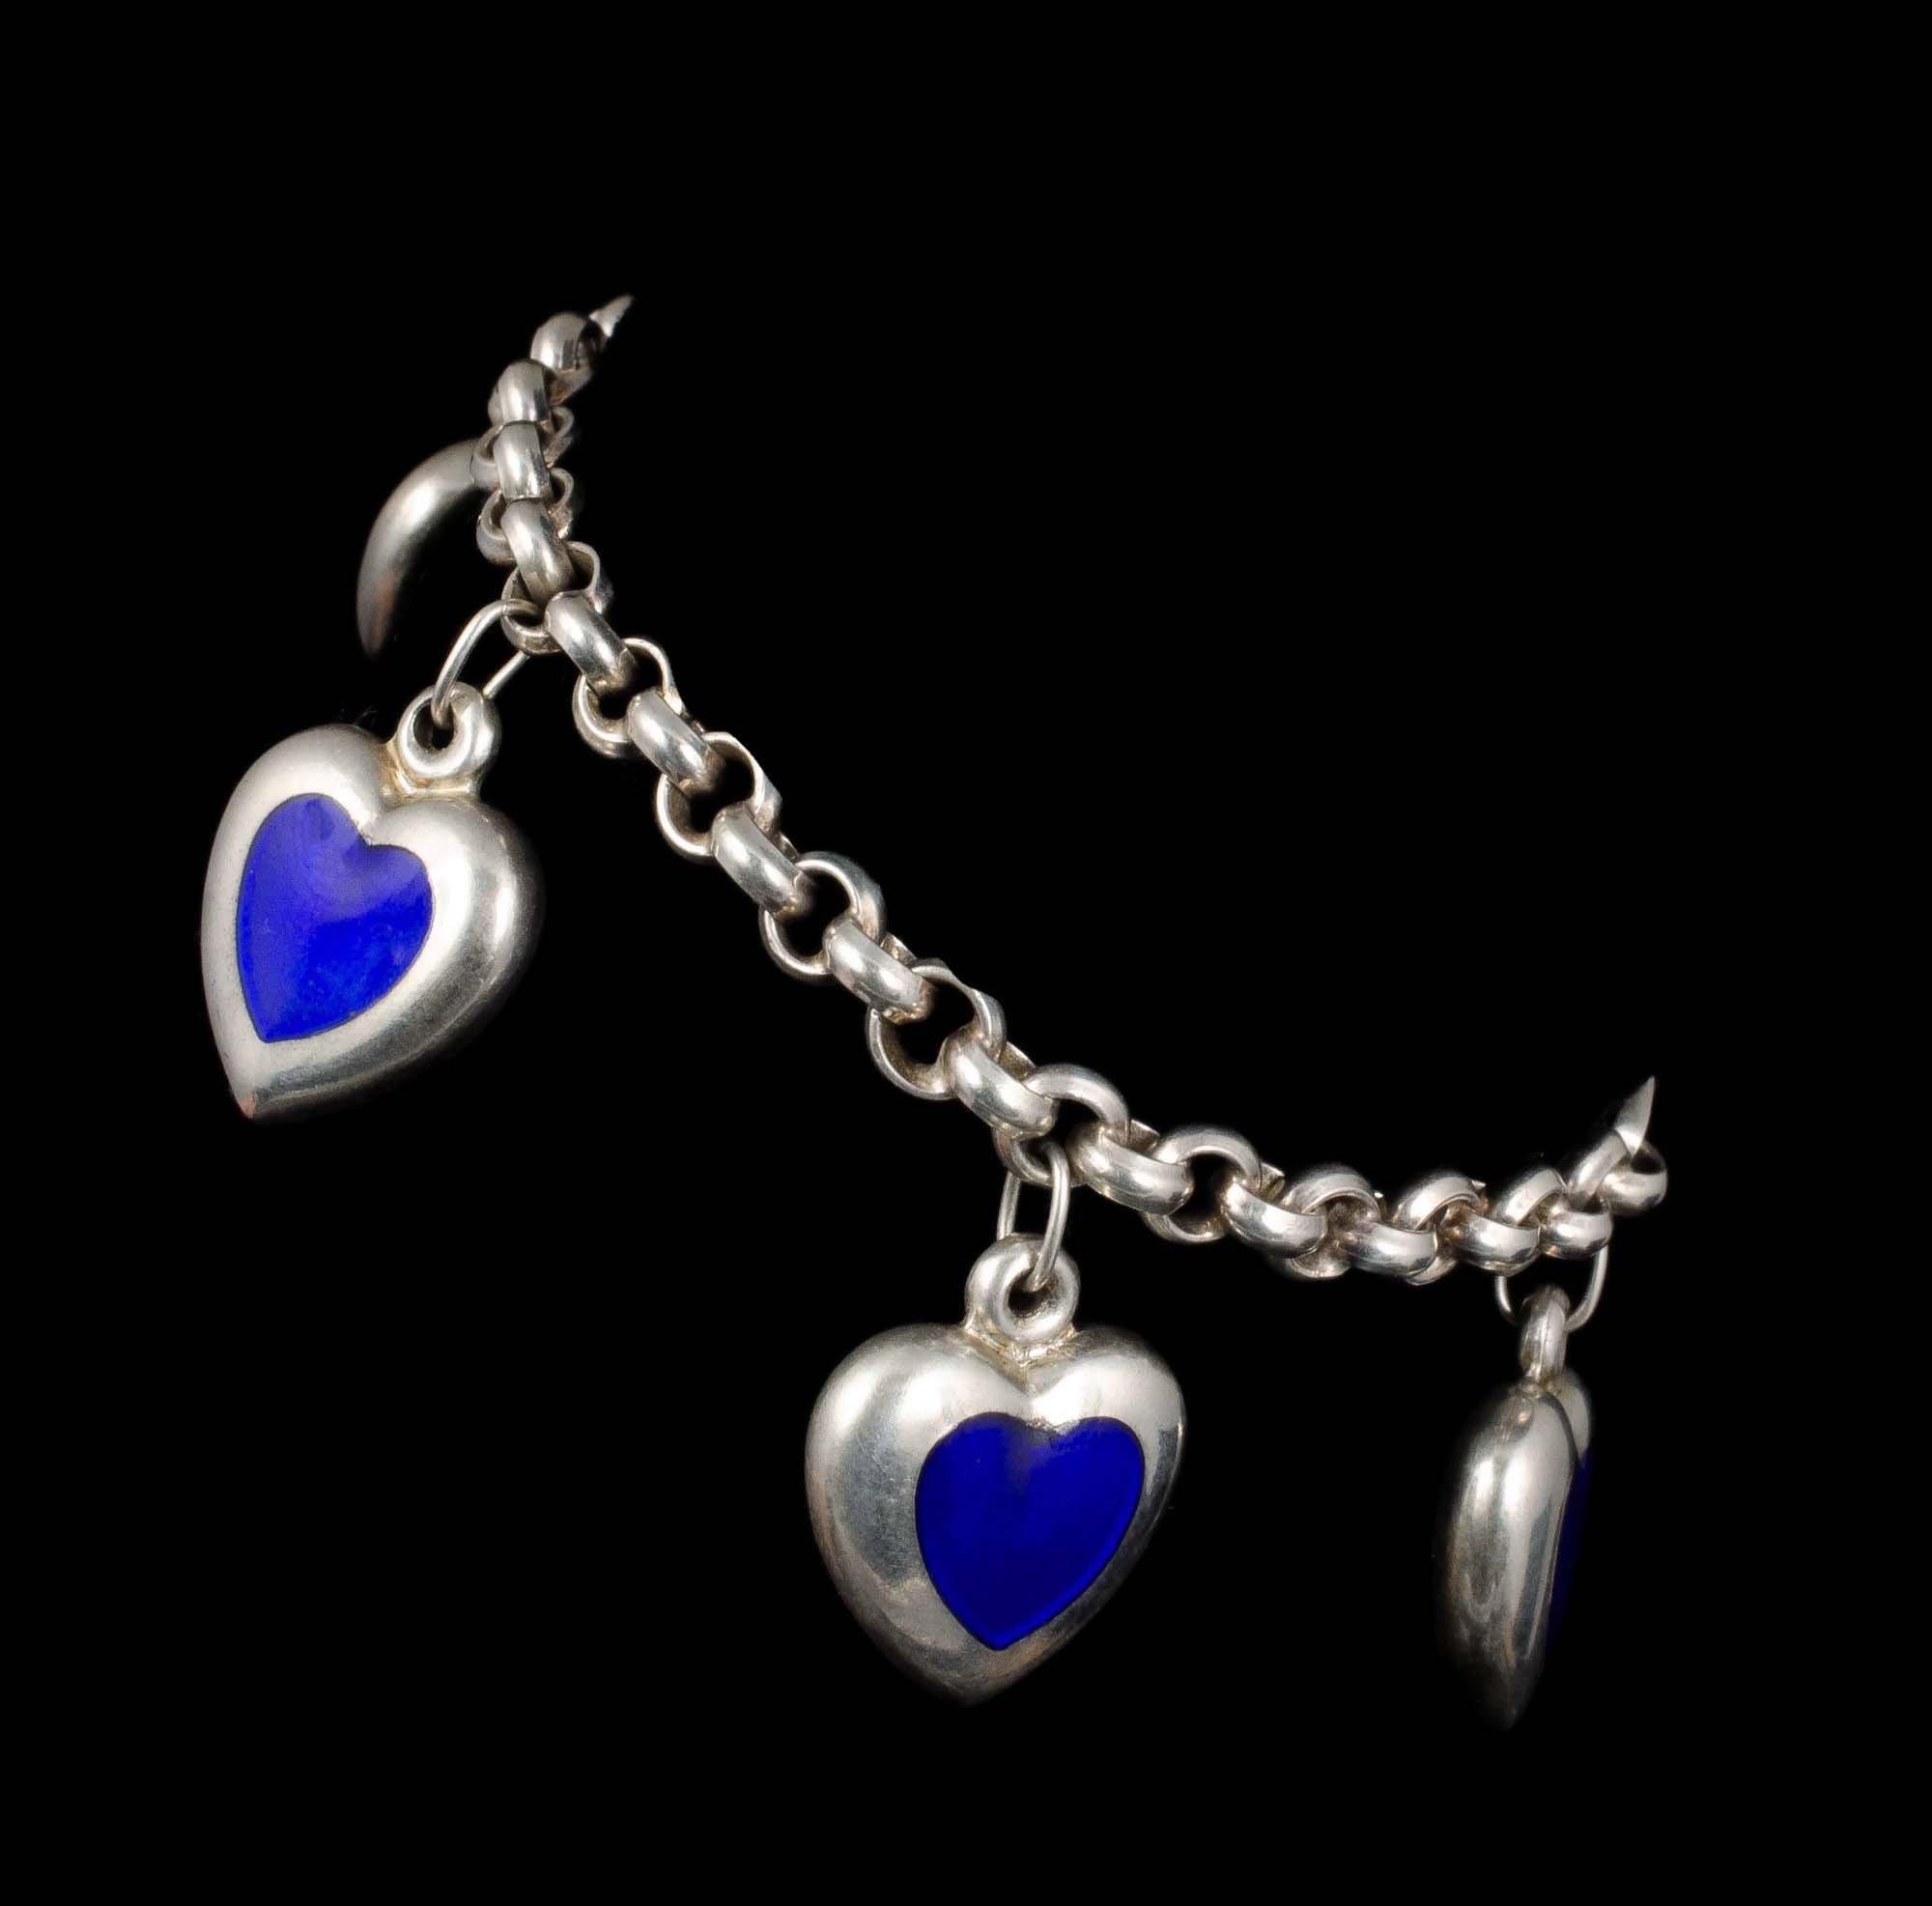 blueheartscharmbrac4.jpg